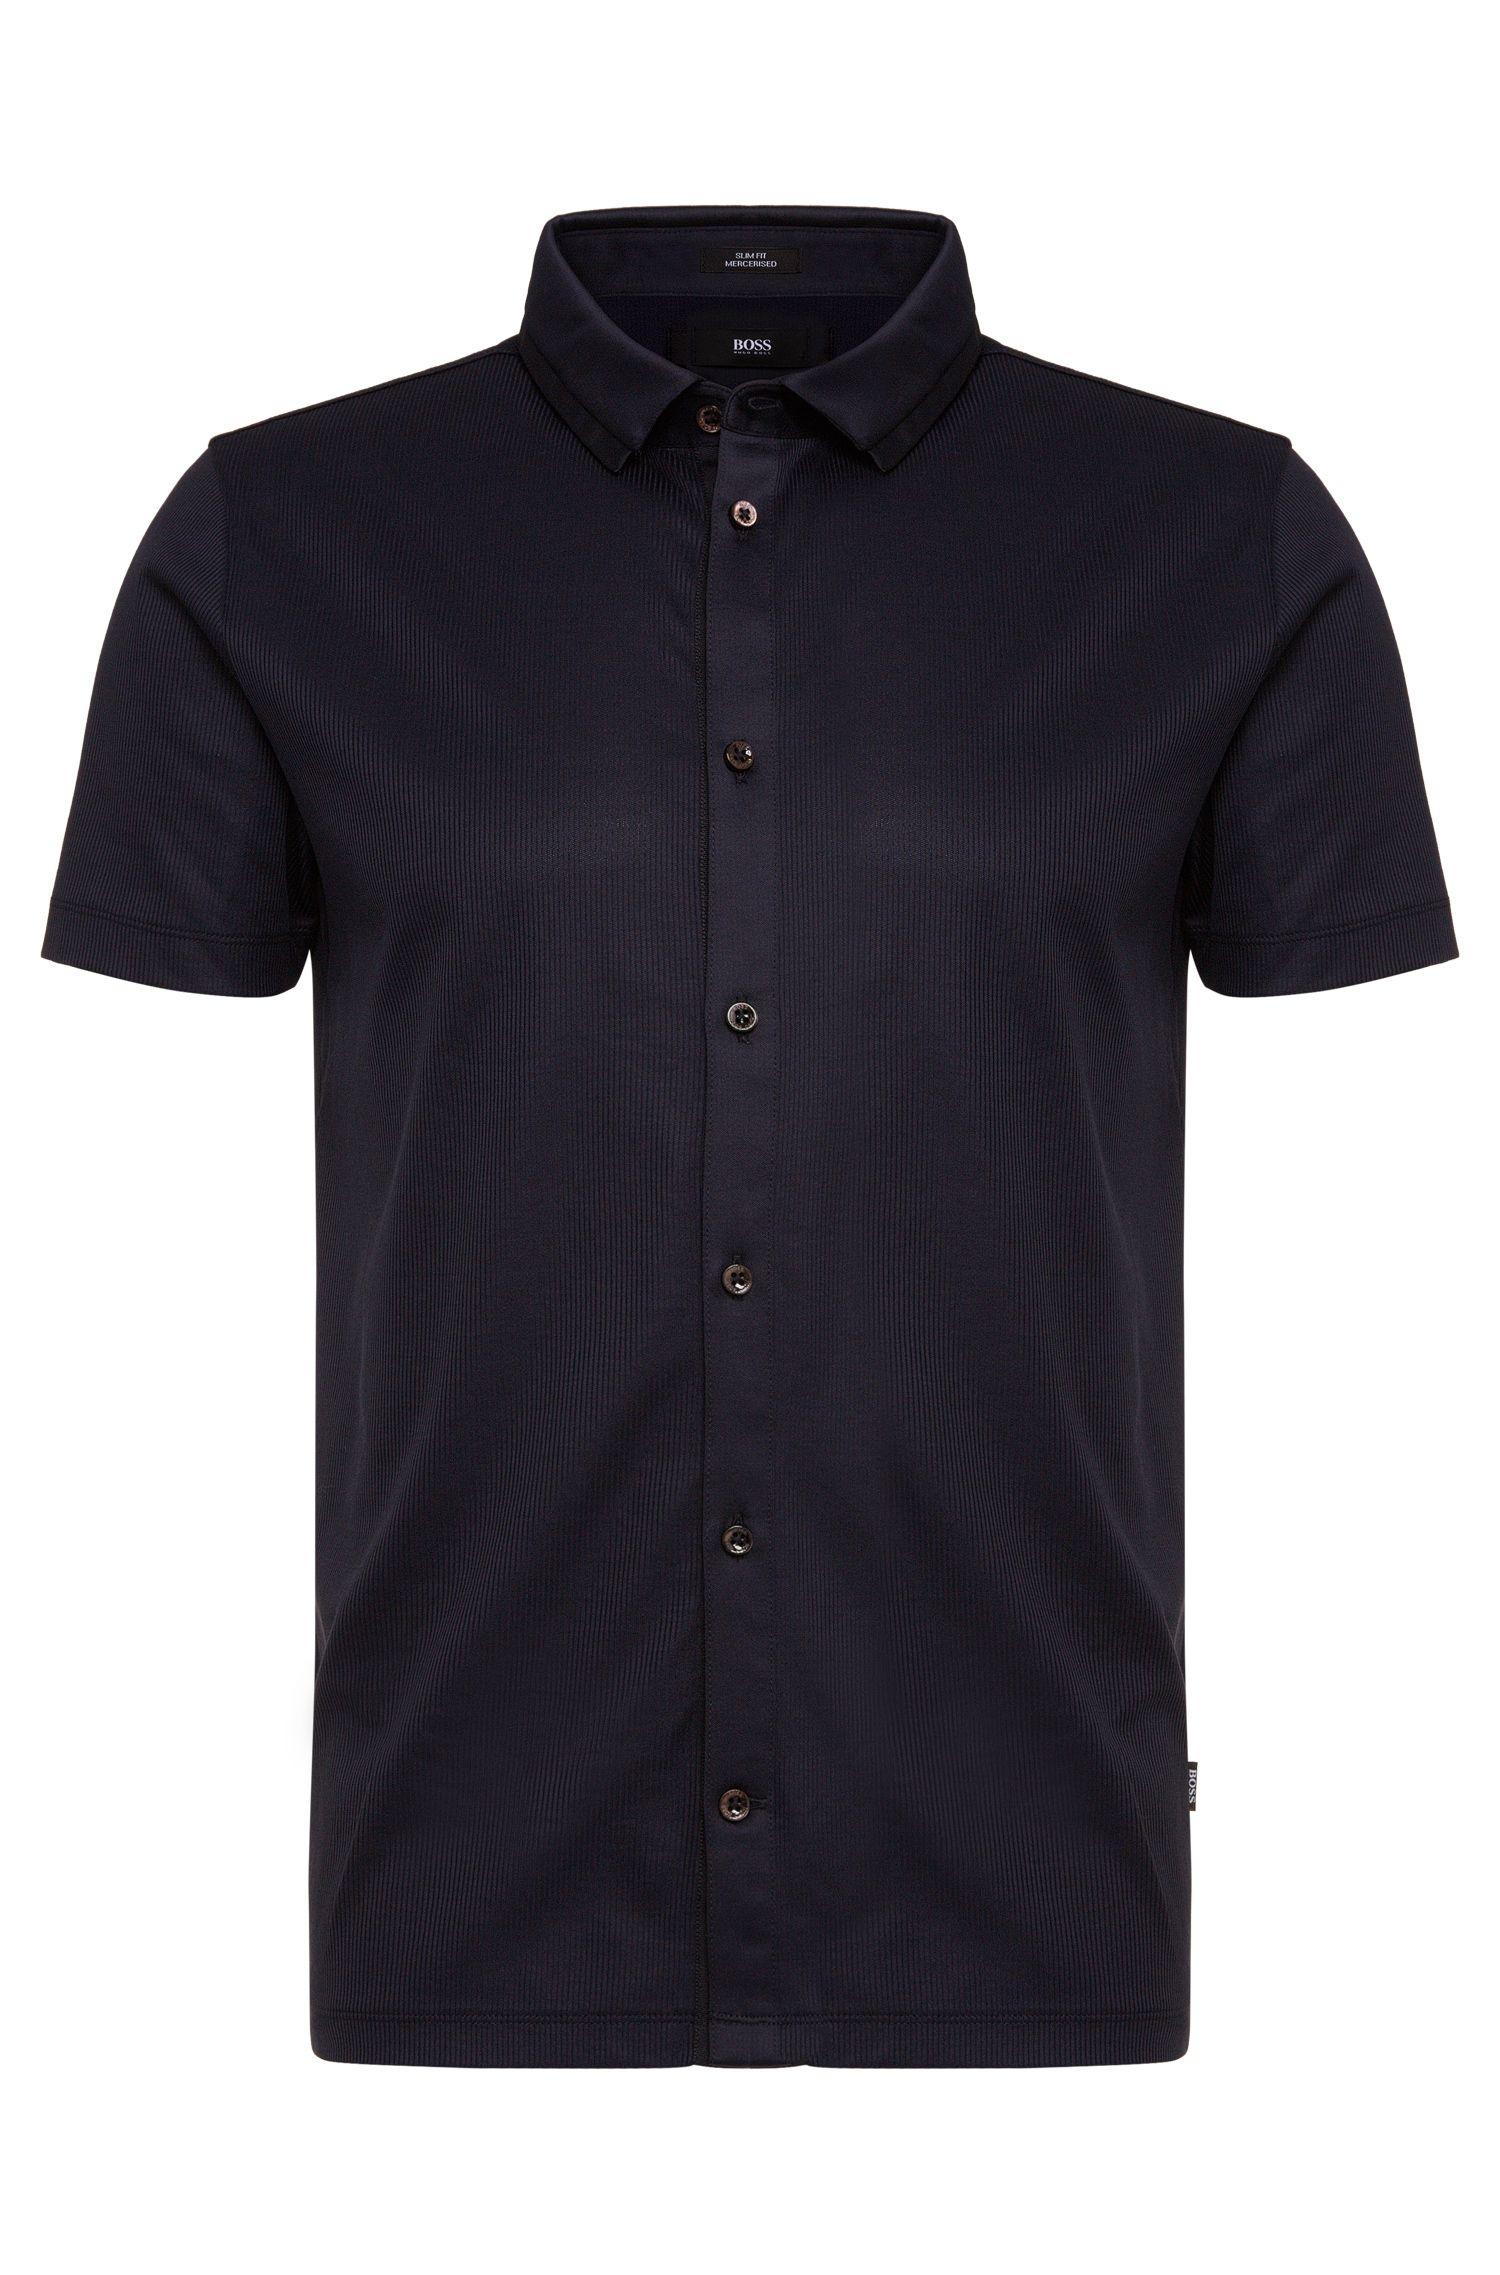 'Puno' | Slim Fit, Mercerized Cotton Button Down Polo Shirt